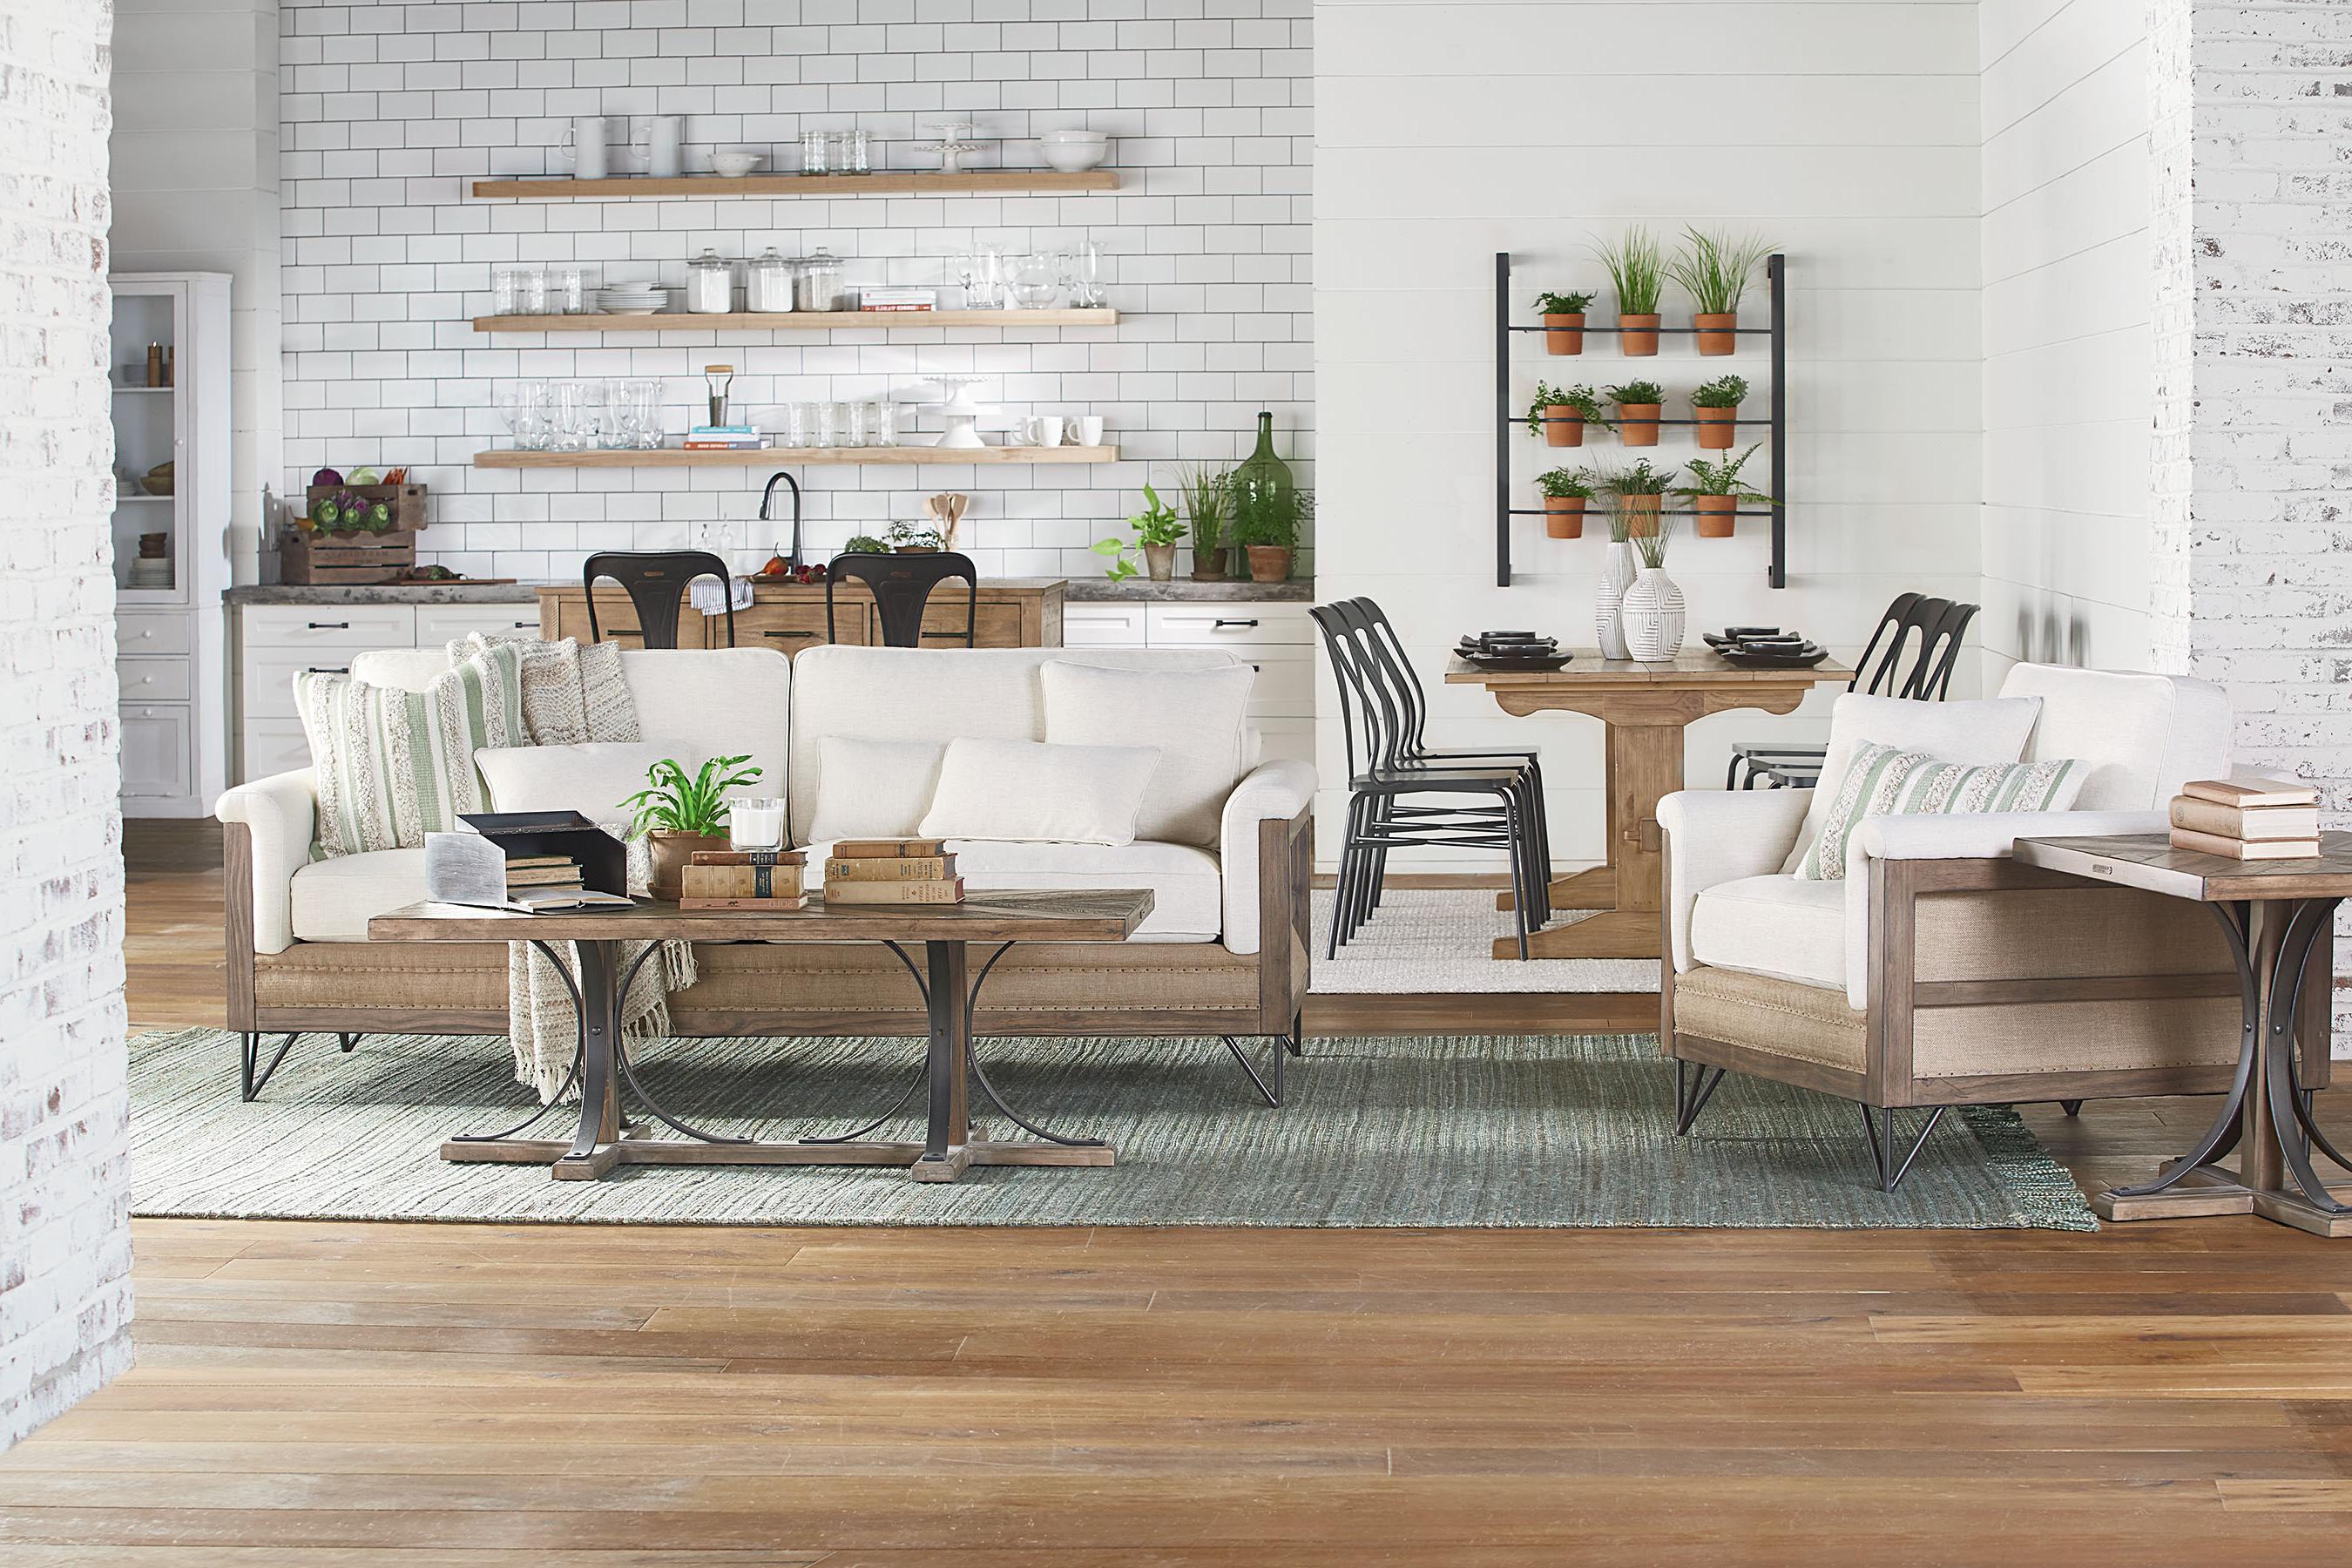 Magnolia Home Paradigm Sofa Chairs By Joanna Gaines In 2019 Paradigm Sofa – Magnolia Home (View 10 of 20)